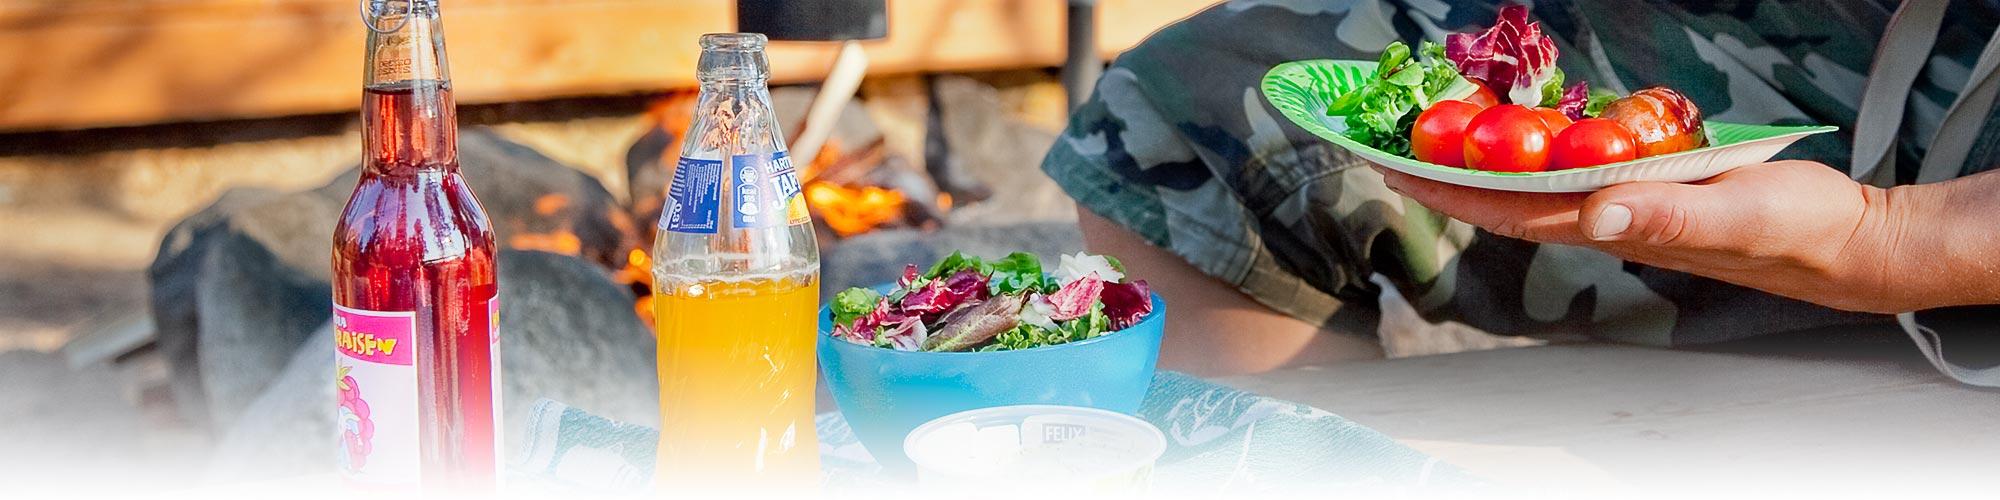 Tommolansalmi ravintola piknik